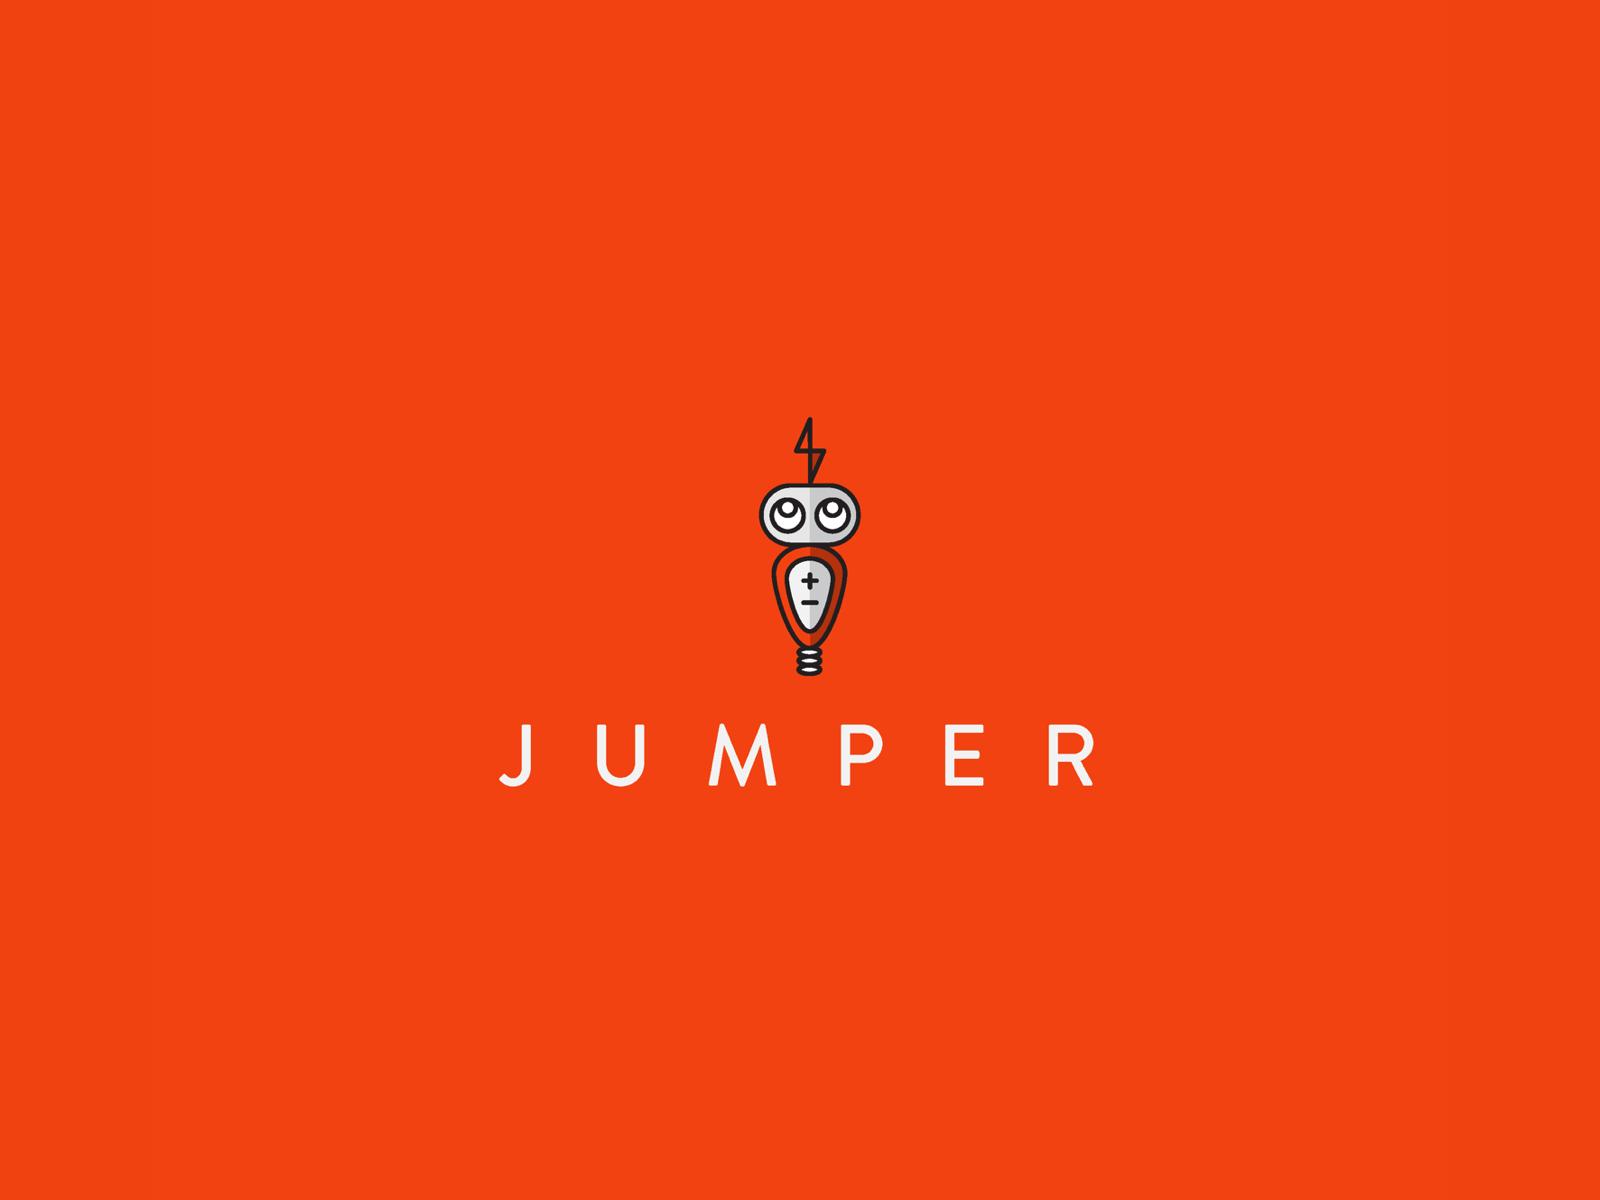 Jumper_Thumbnail.png